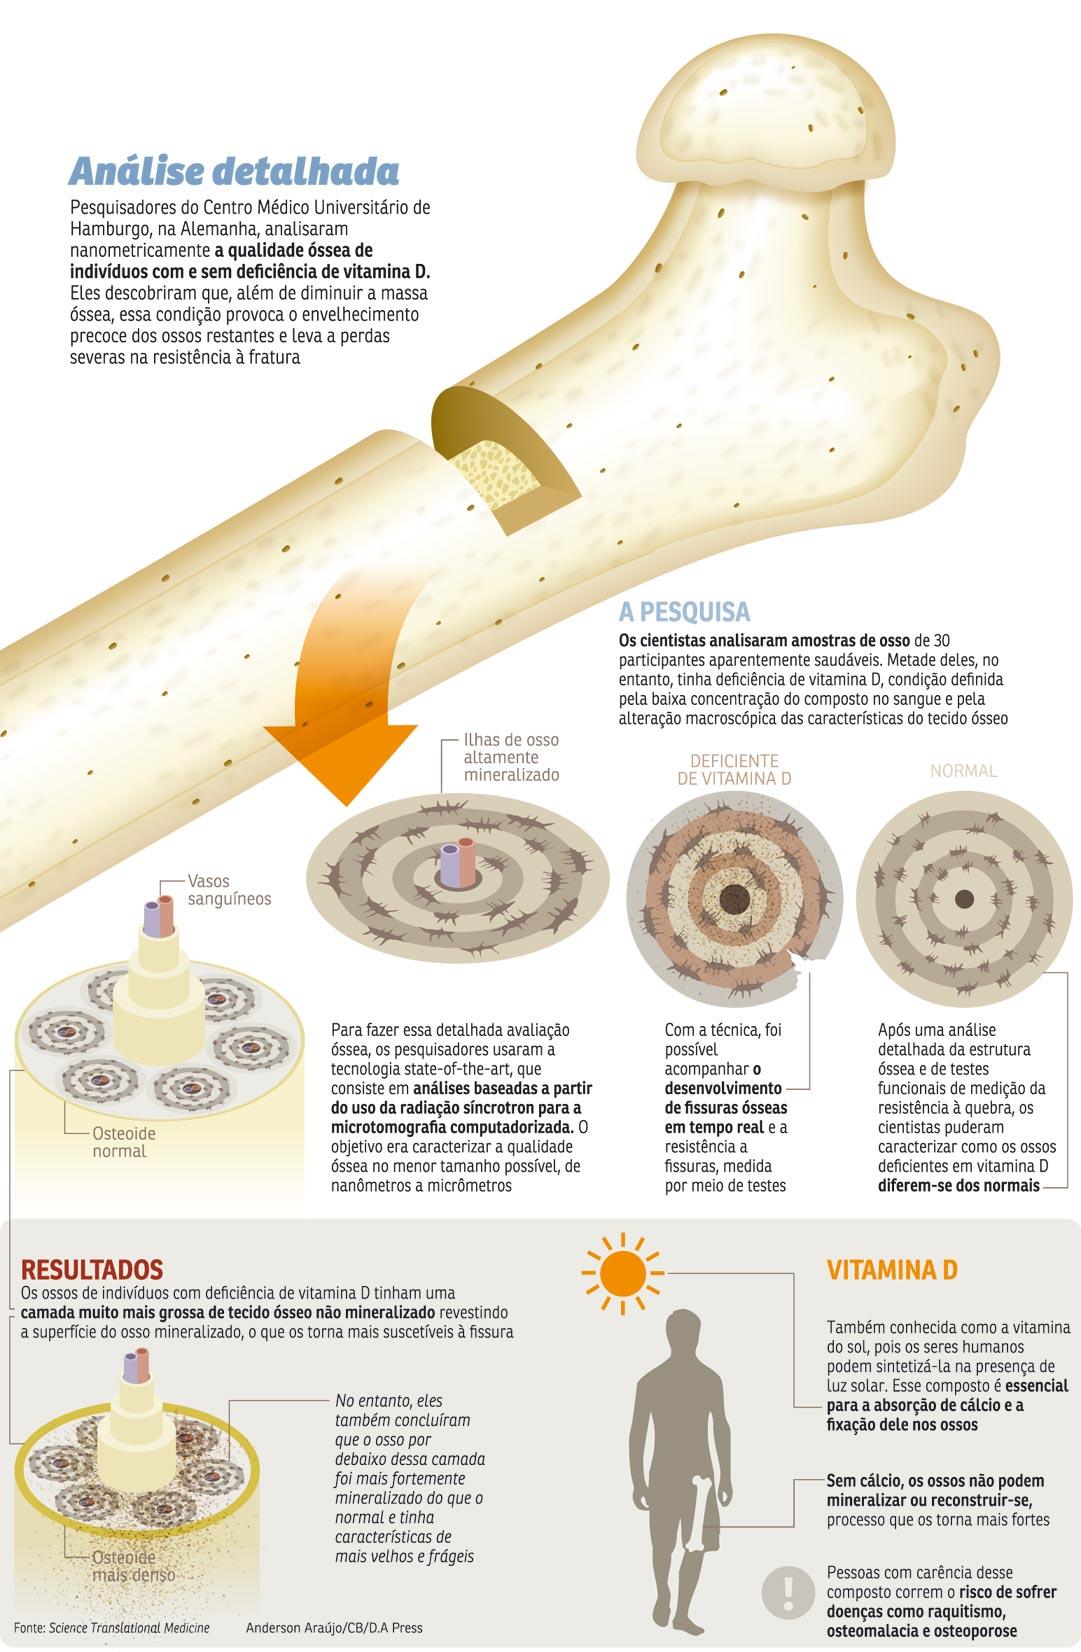 Falta de vitamina D também endurece os ossos